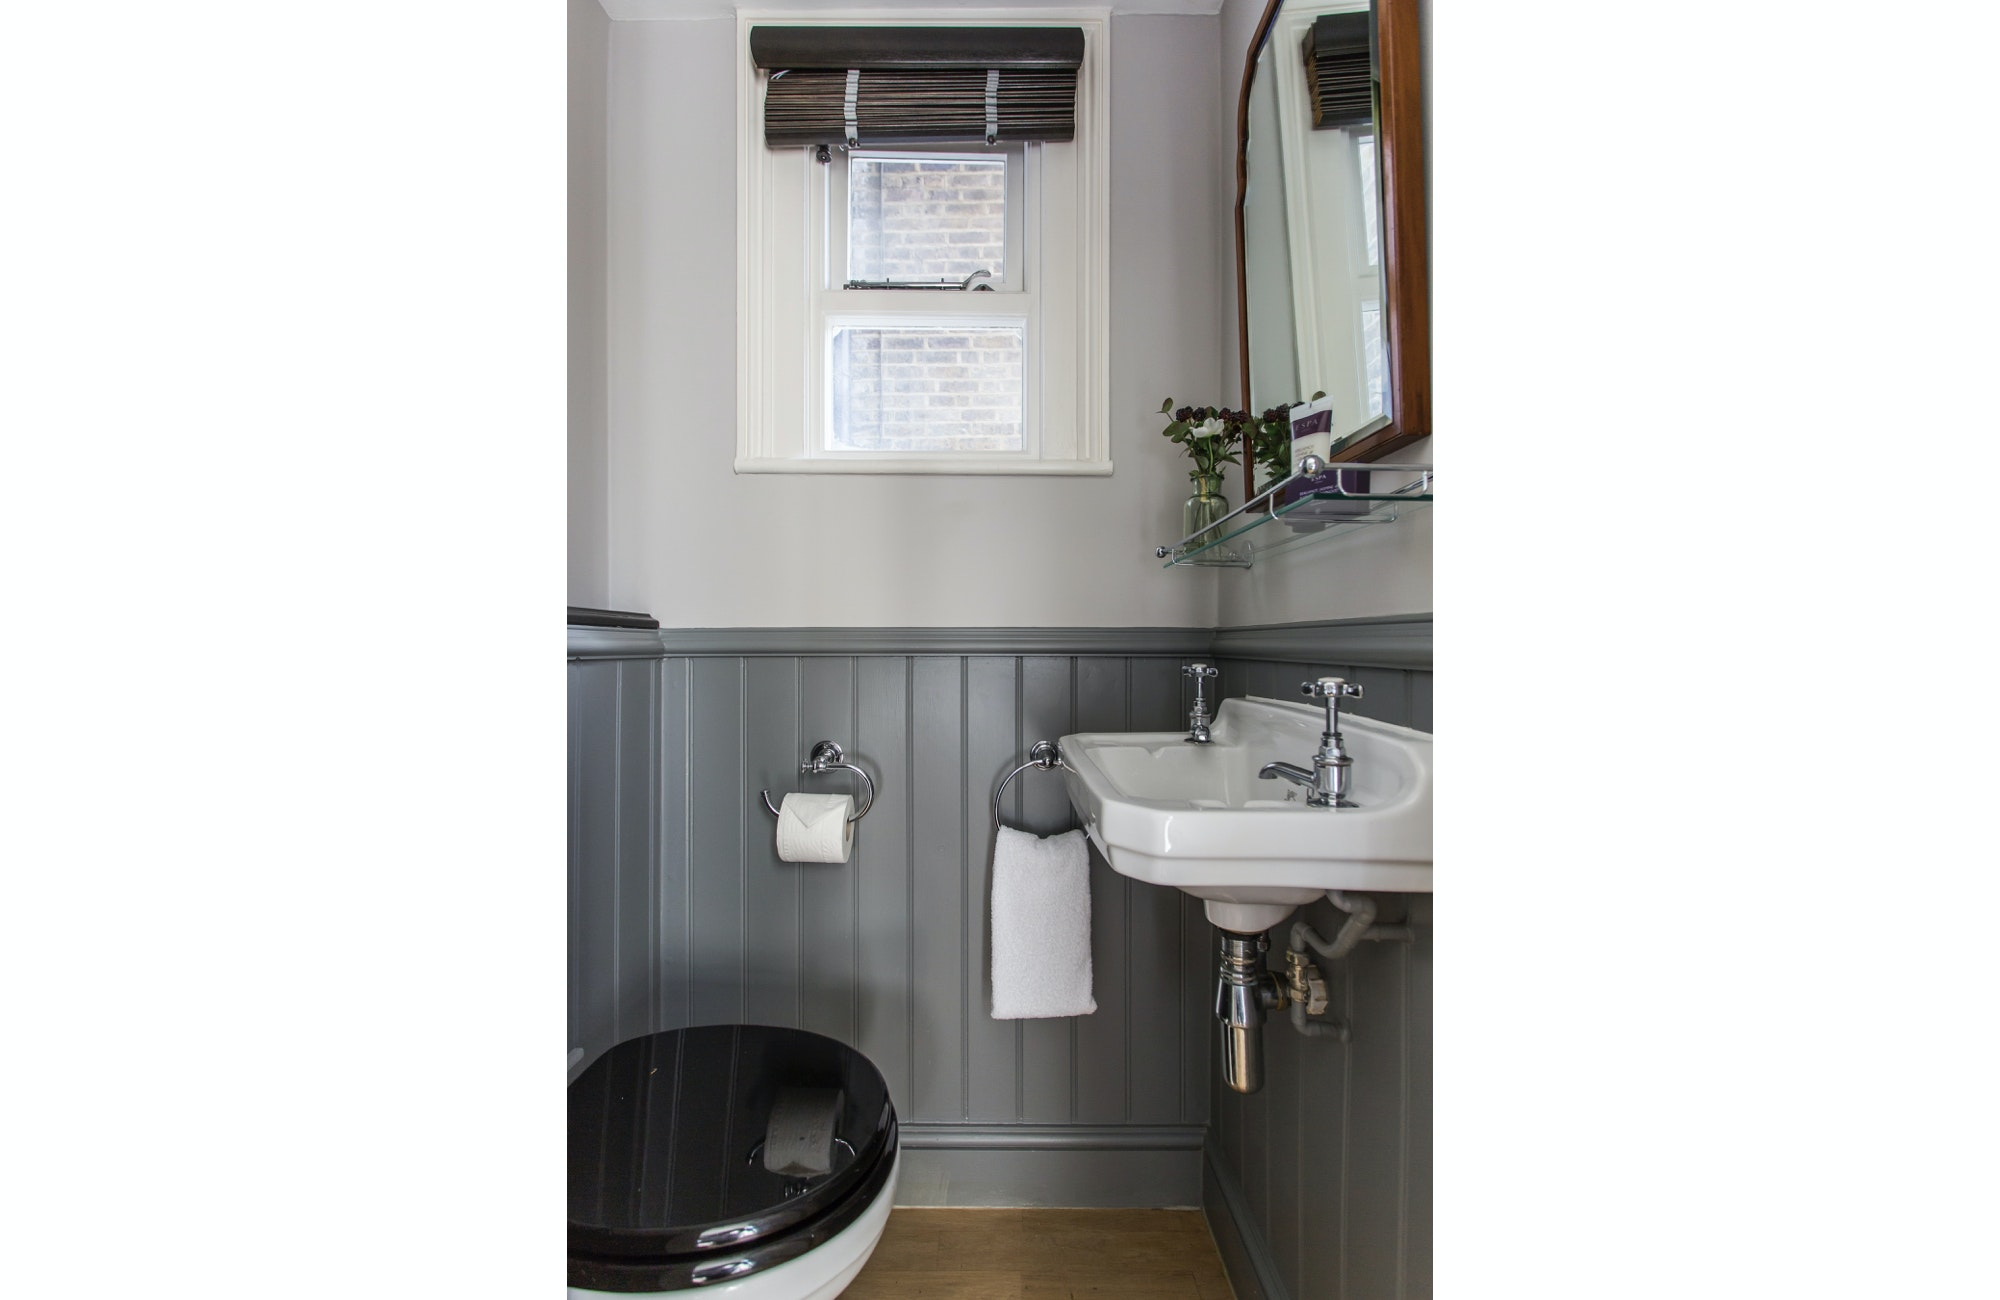 Alice in Wondeland Decorative Ceramic tile Fireplace kitchens bathrooms  #3